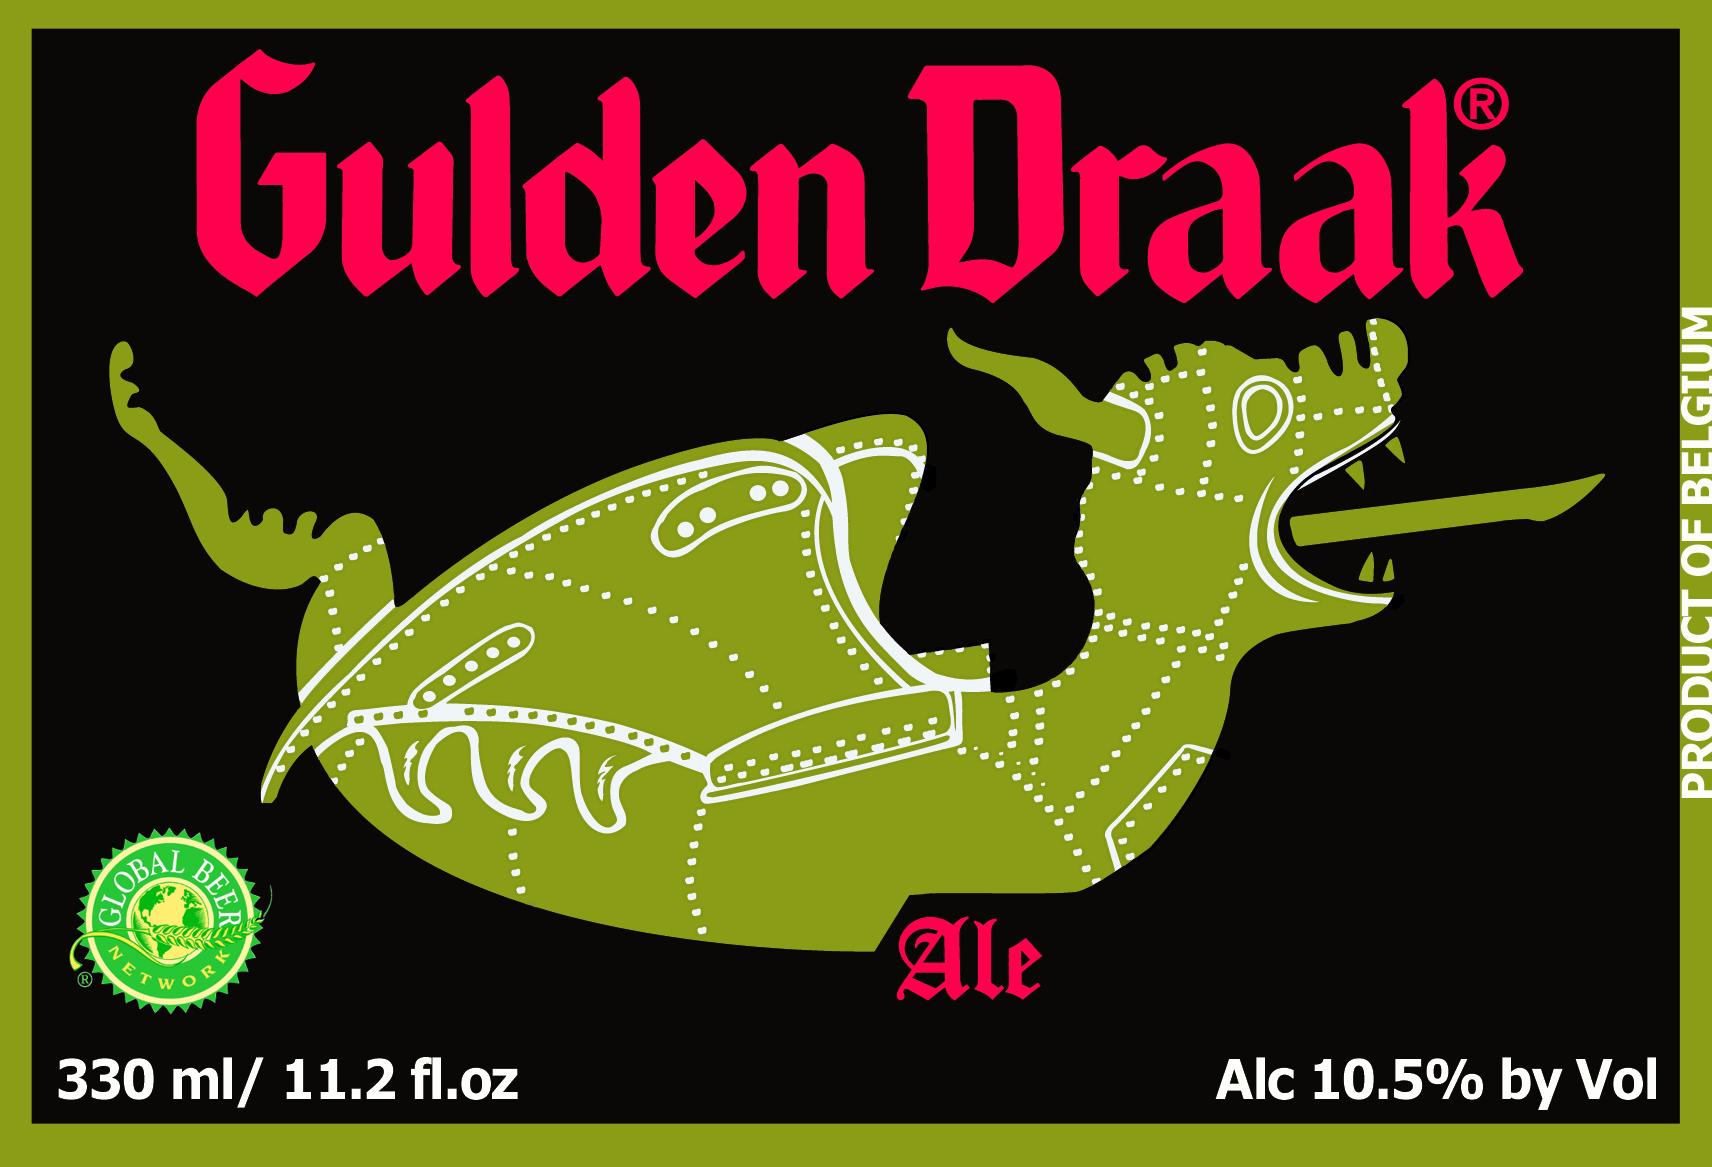 Gulden Draak Image